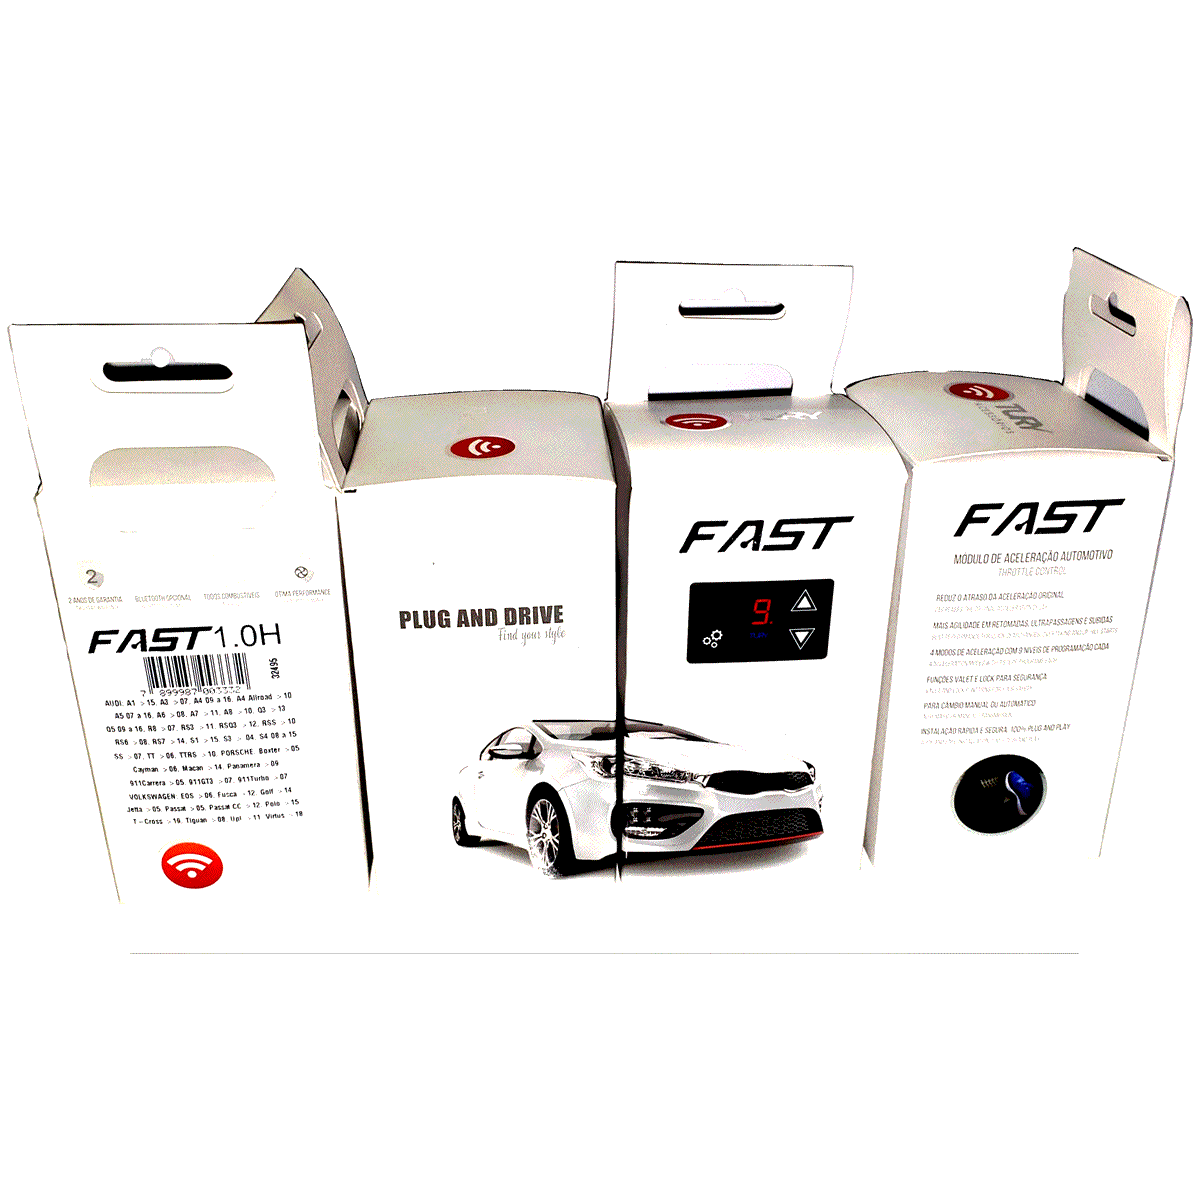 Fast 1.0 AE Kia Cerato Módulo Acelerador Plug & Play